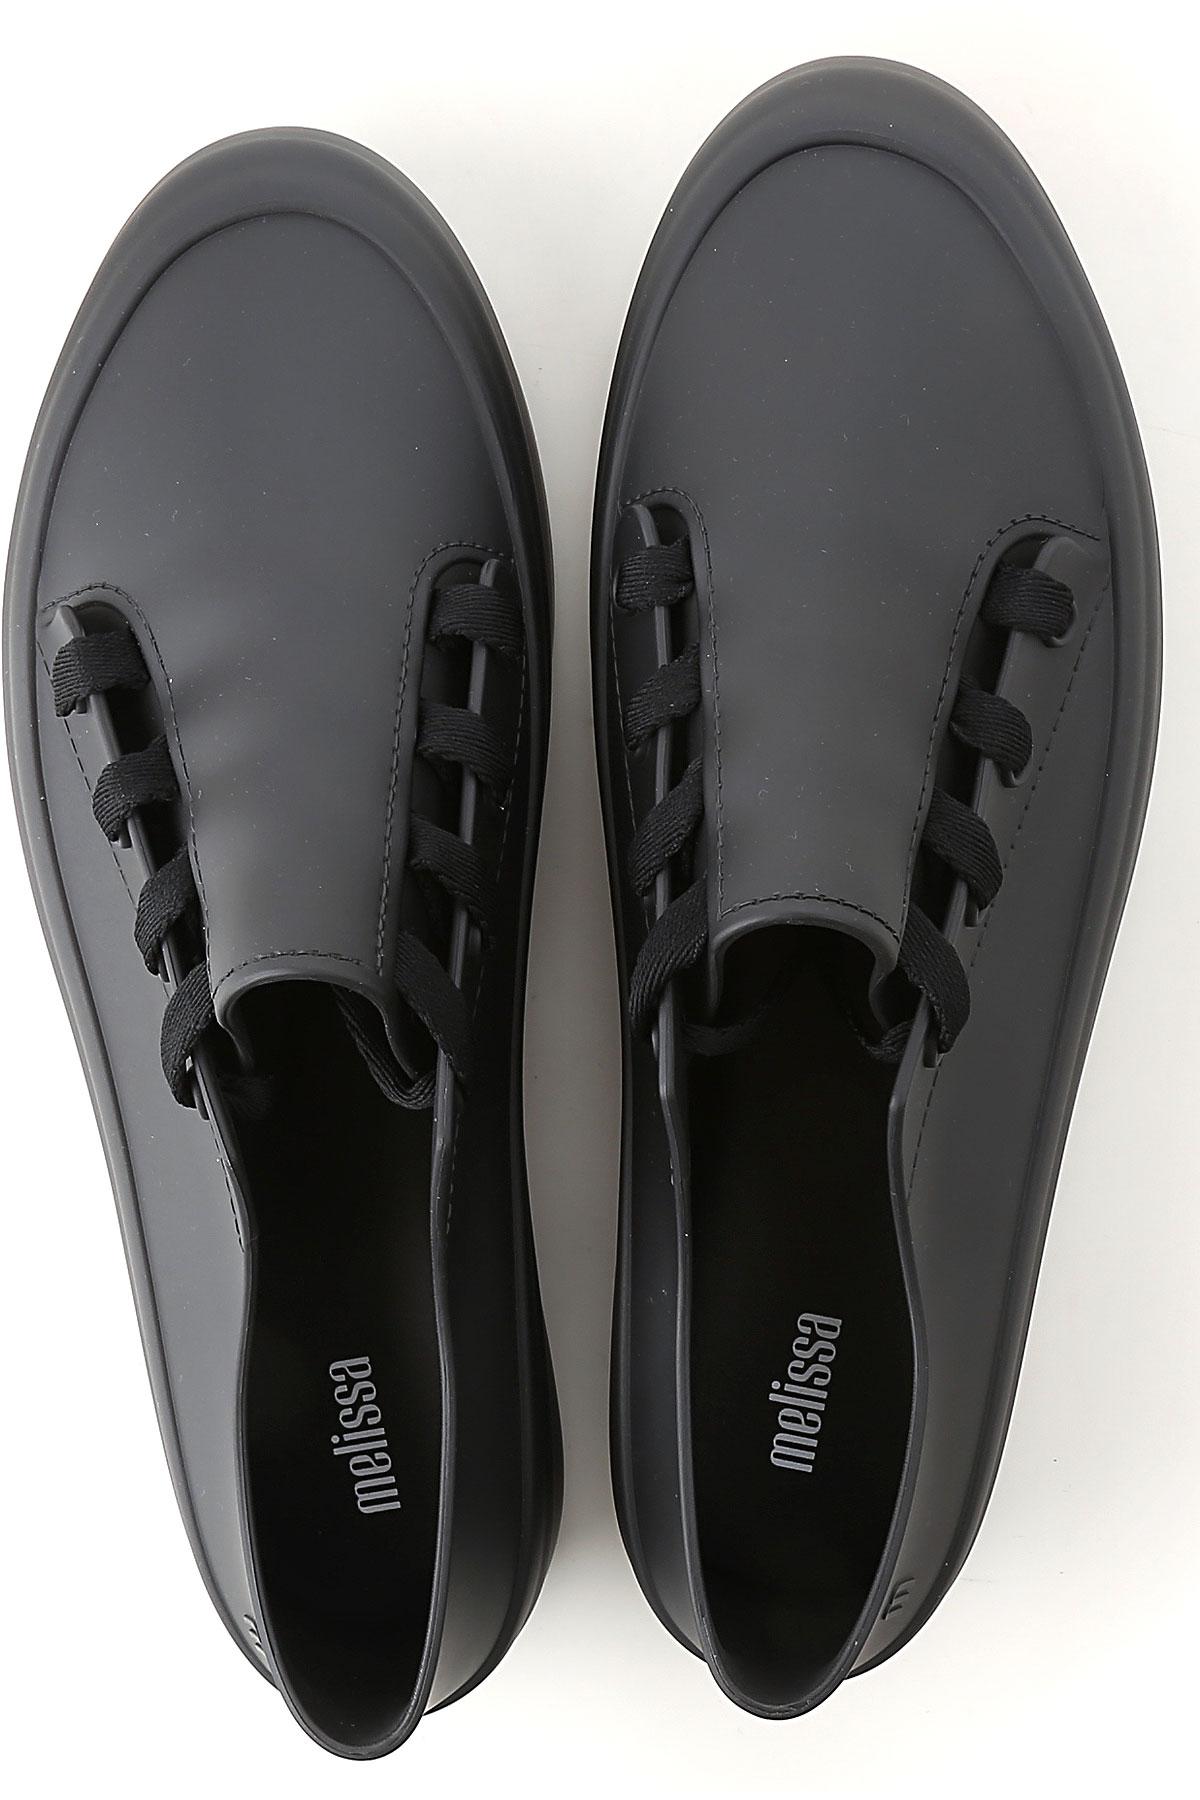 19 Otoño Negro Melissa Hombres nbsp; 2018 Zapatos invierno Para rYWYqtOwB